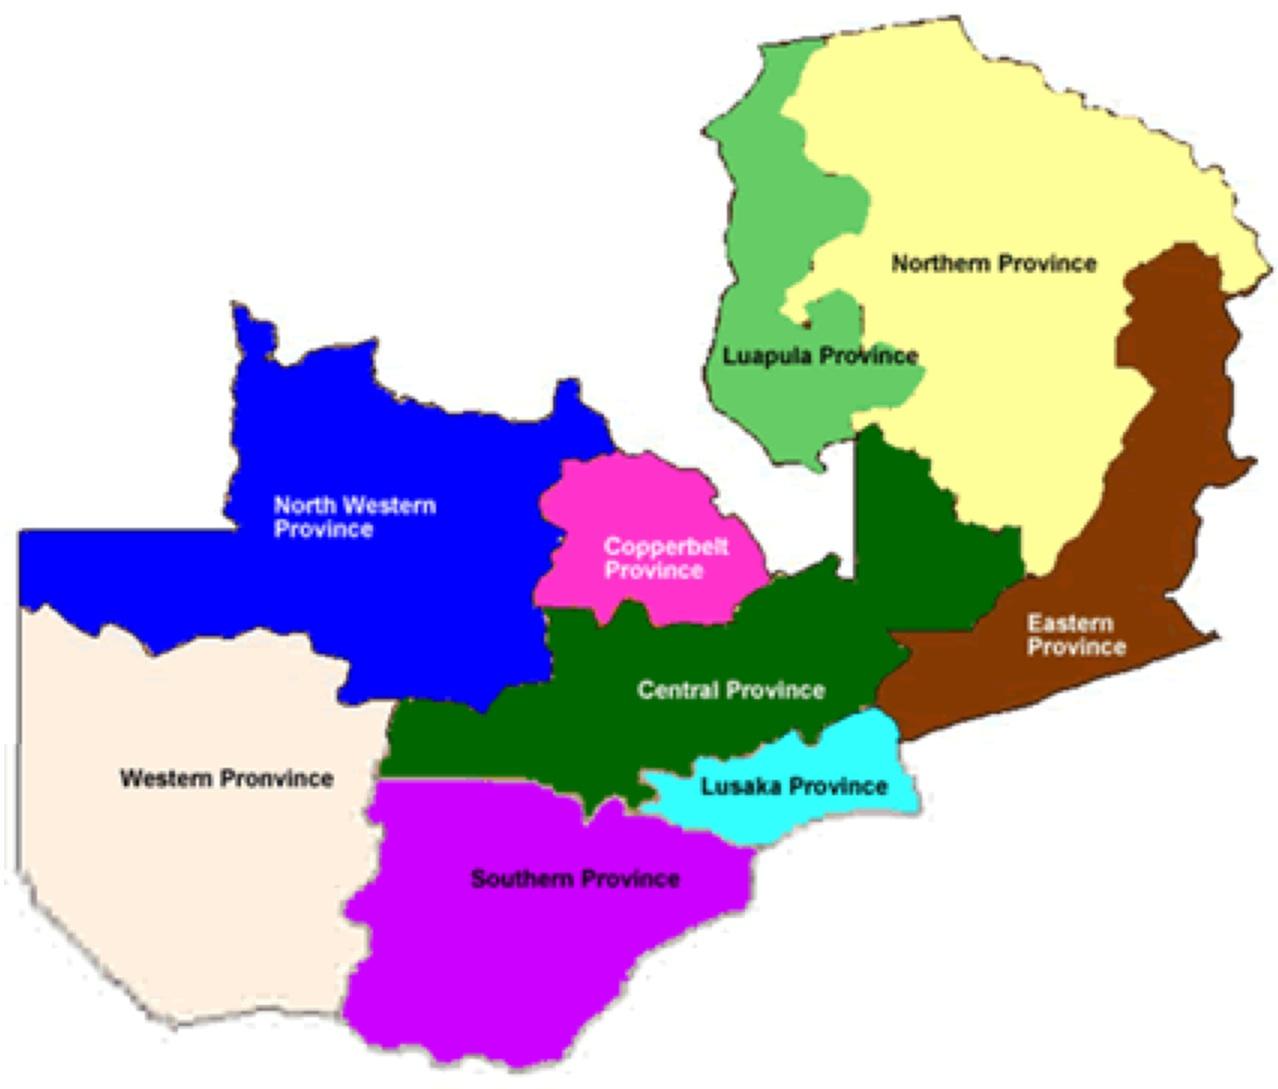 Zambian Economist Zambia Elections 2011 Constituency Maps Updated